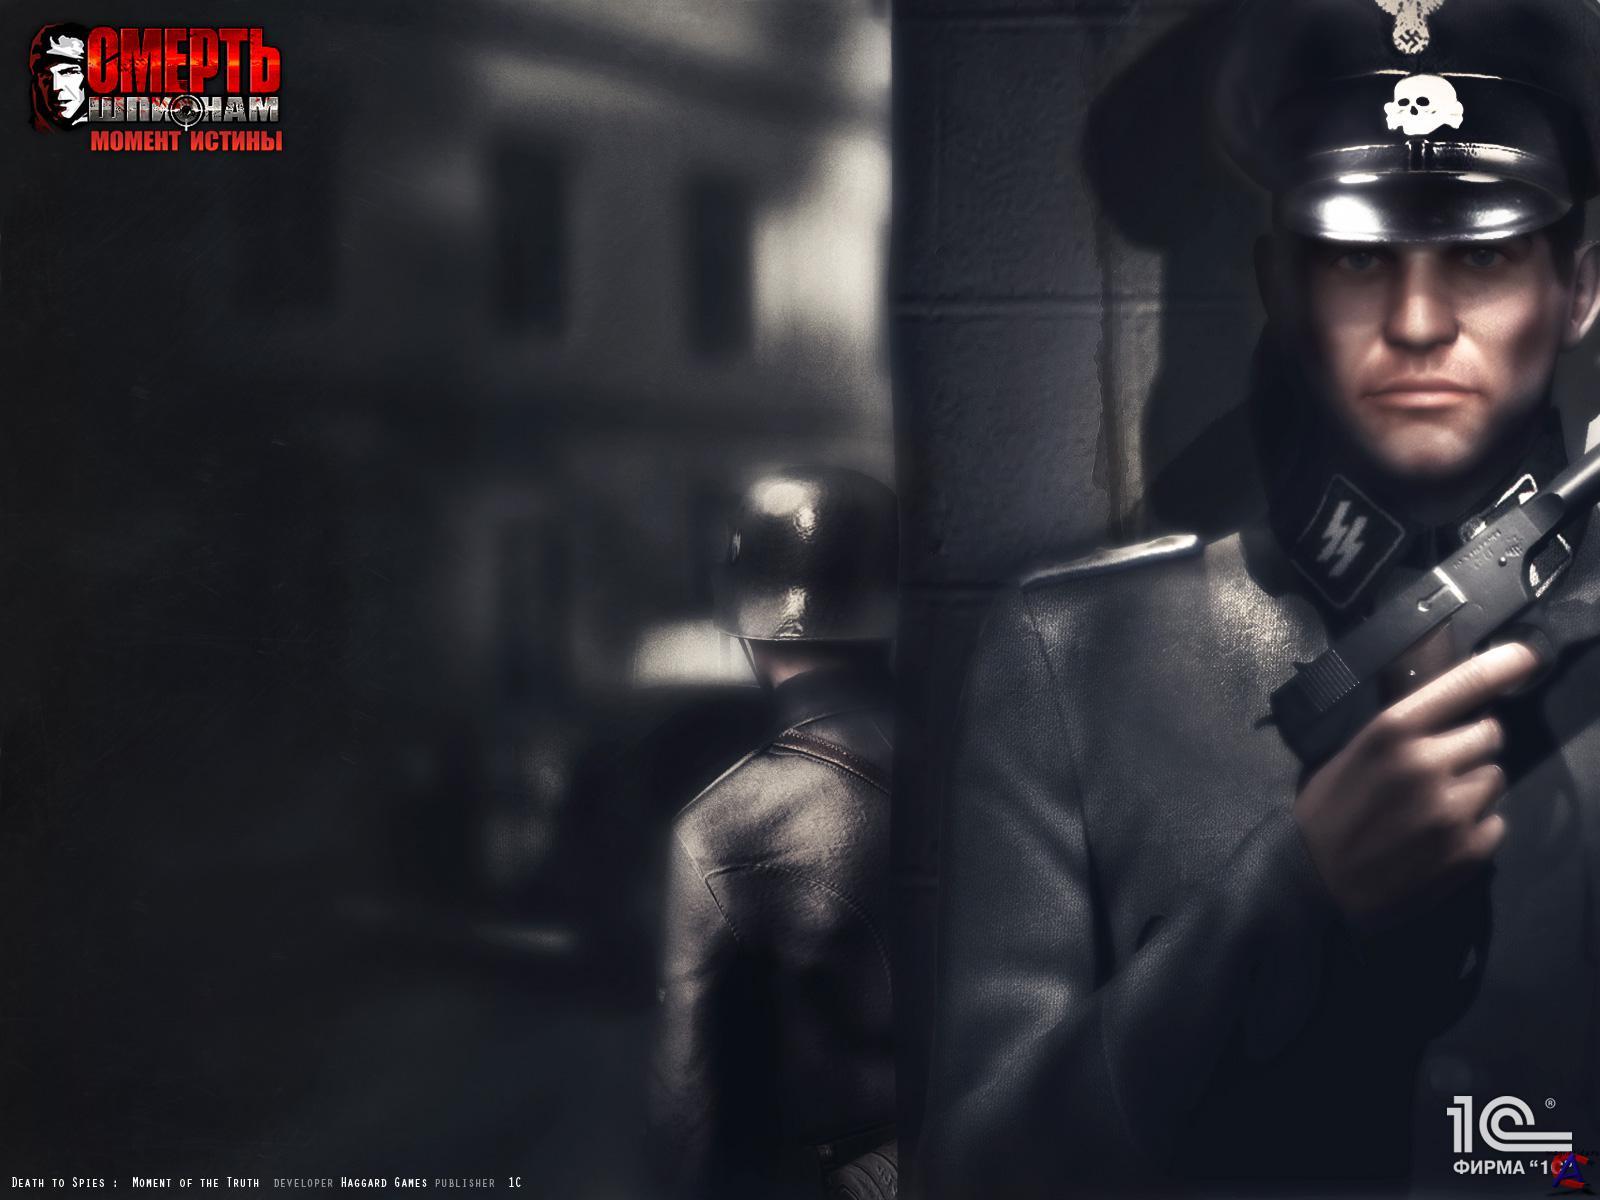 Sid Meier's Civilization V. Смерть шпионам Момент истины. Дата 11